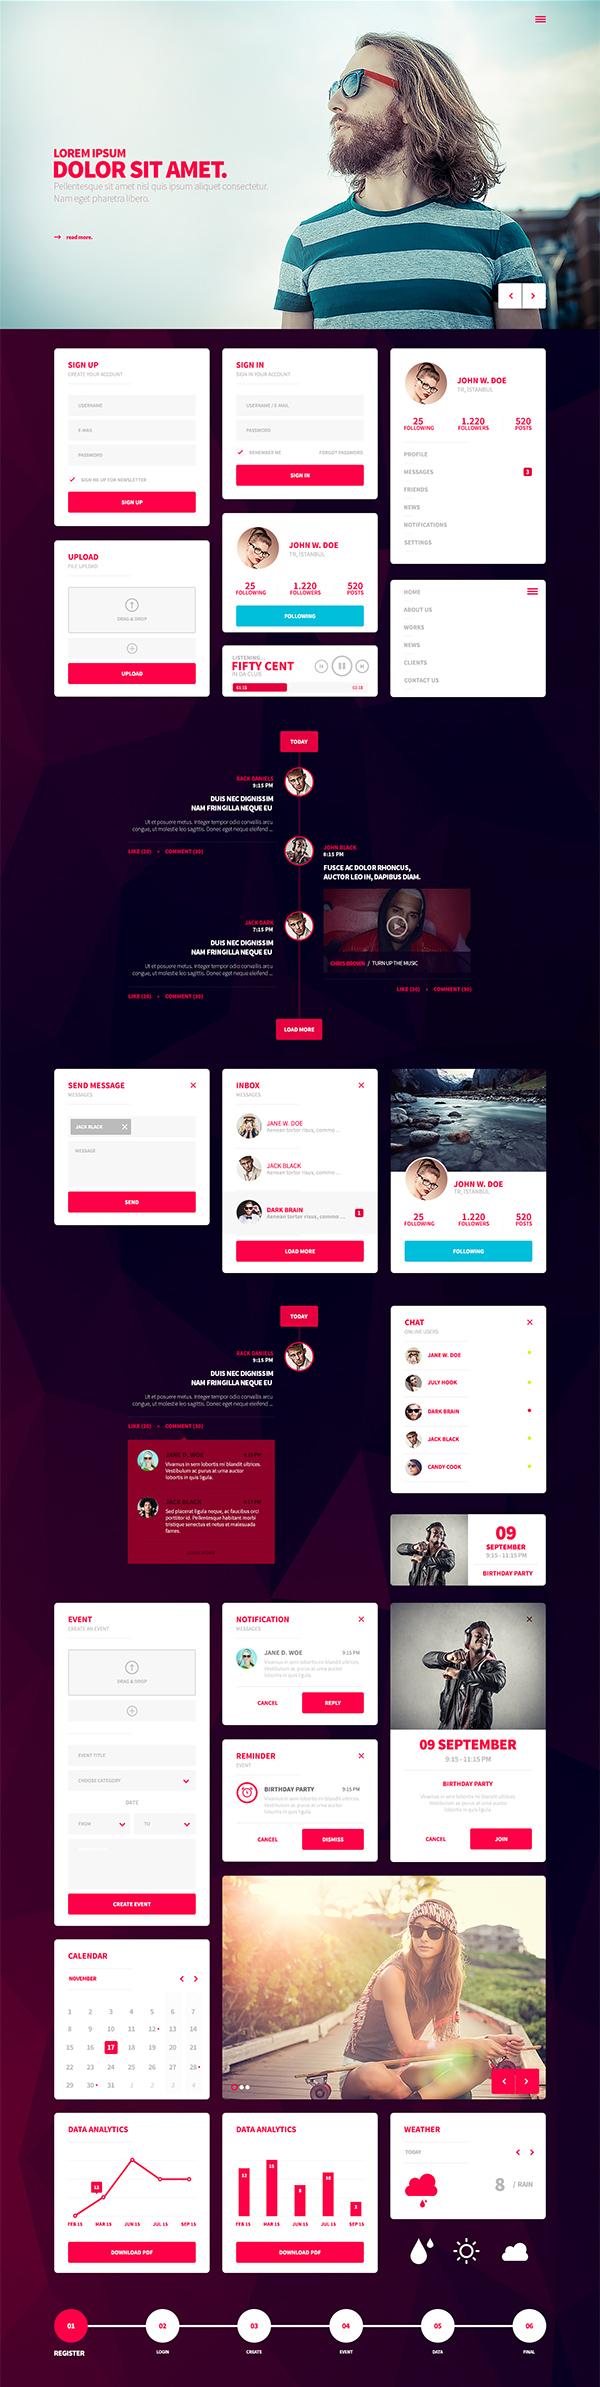 Nakropol – Free UI Kit for Web / Mobile UI